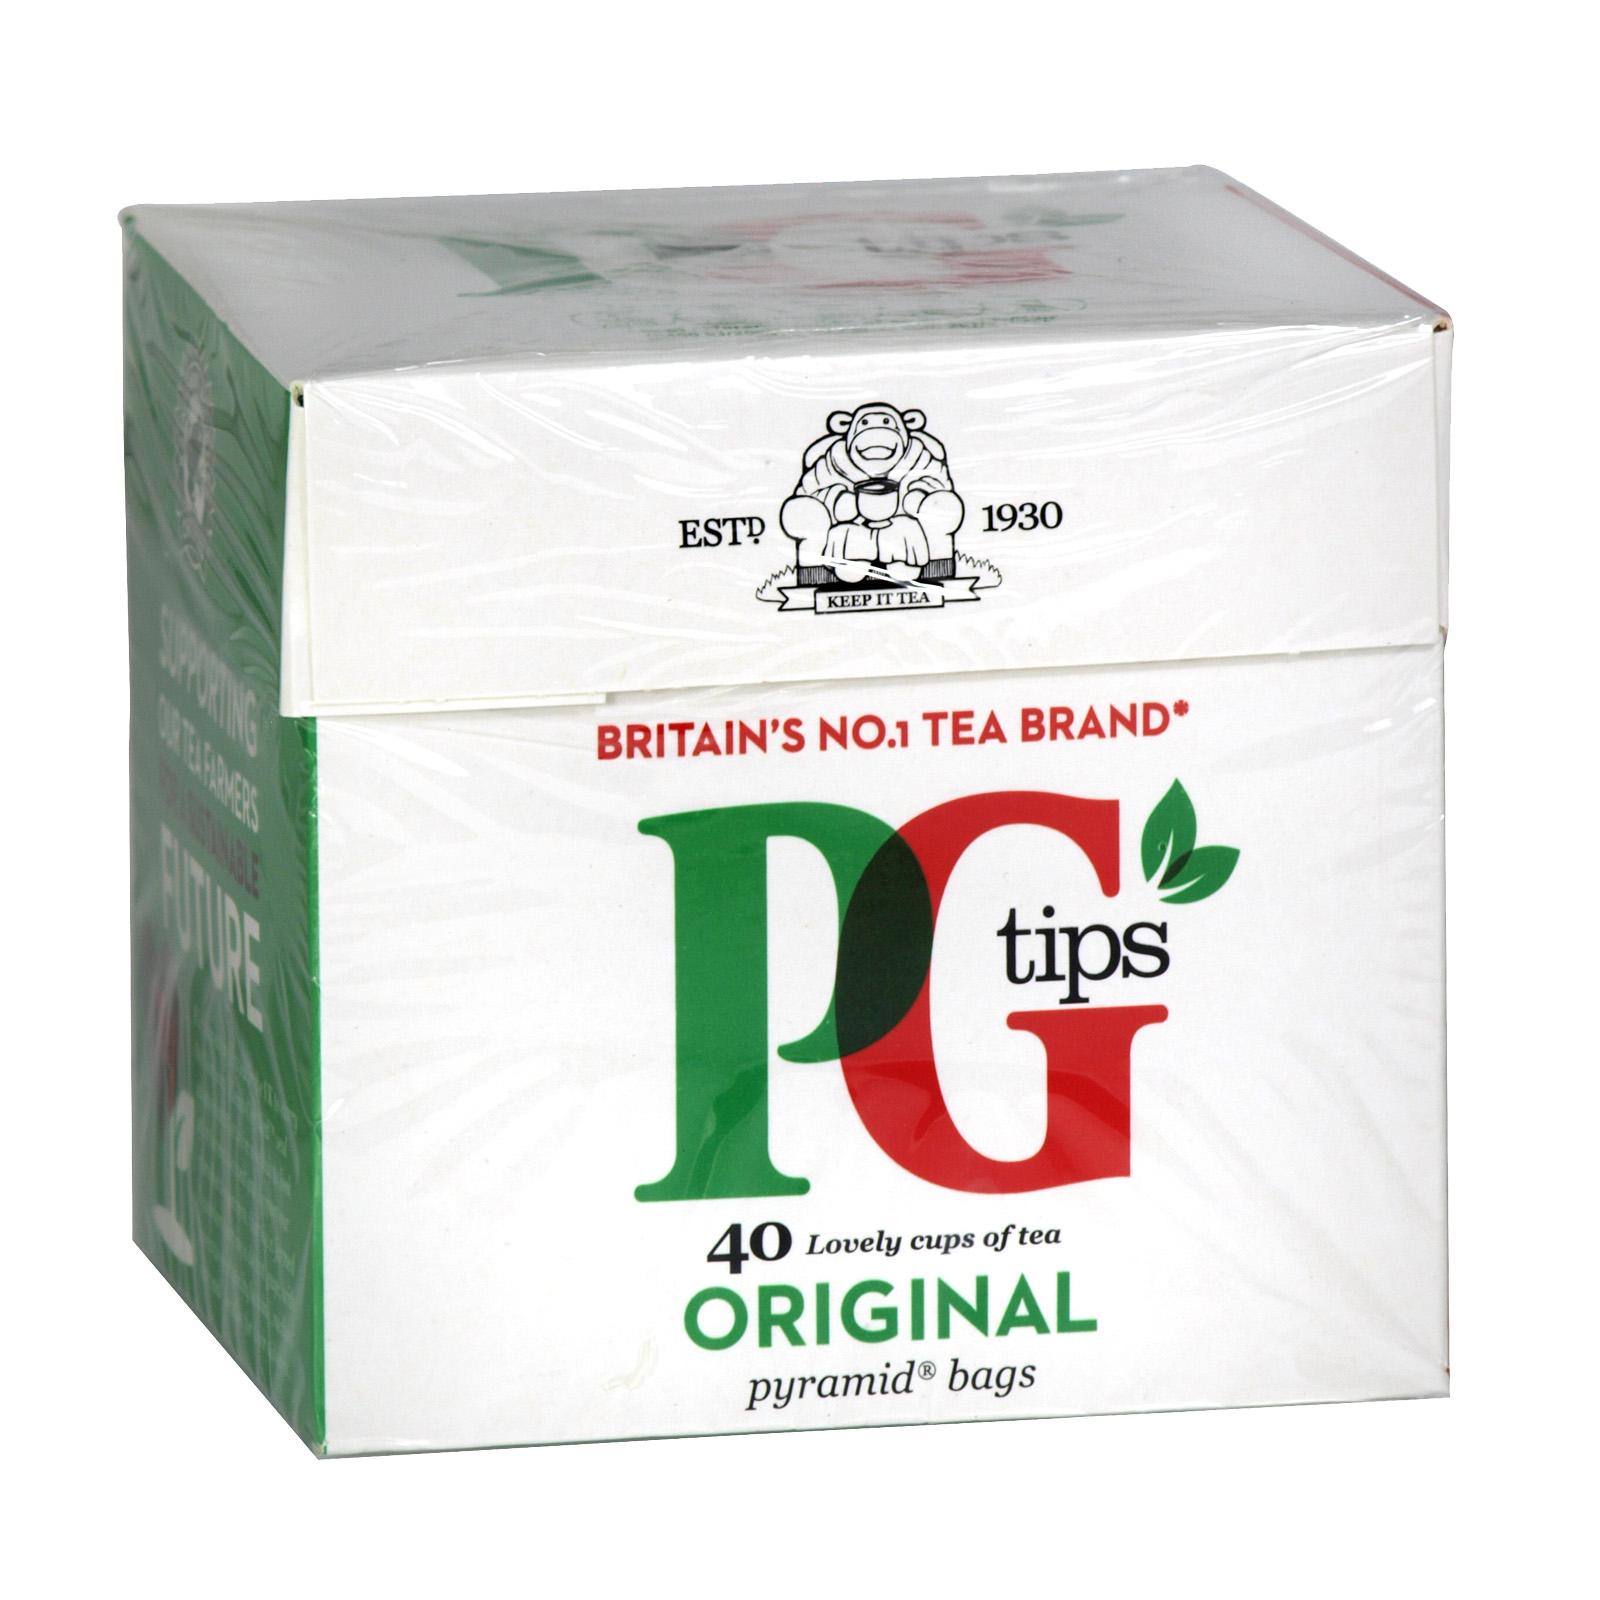 PG TIPS TEA BAGS 40S X24